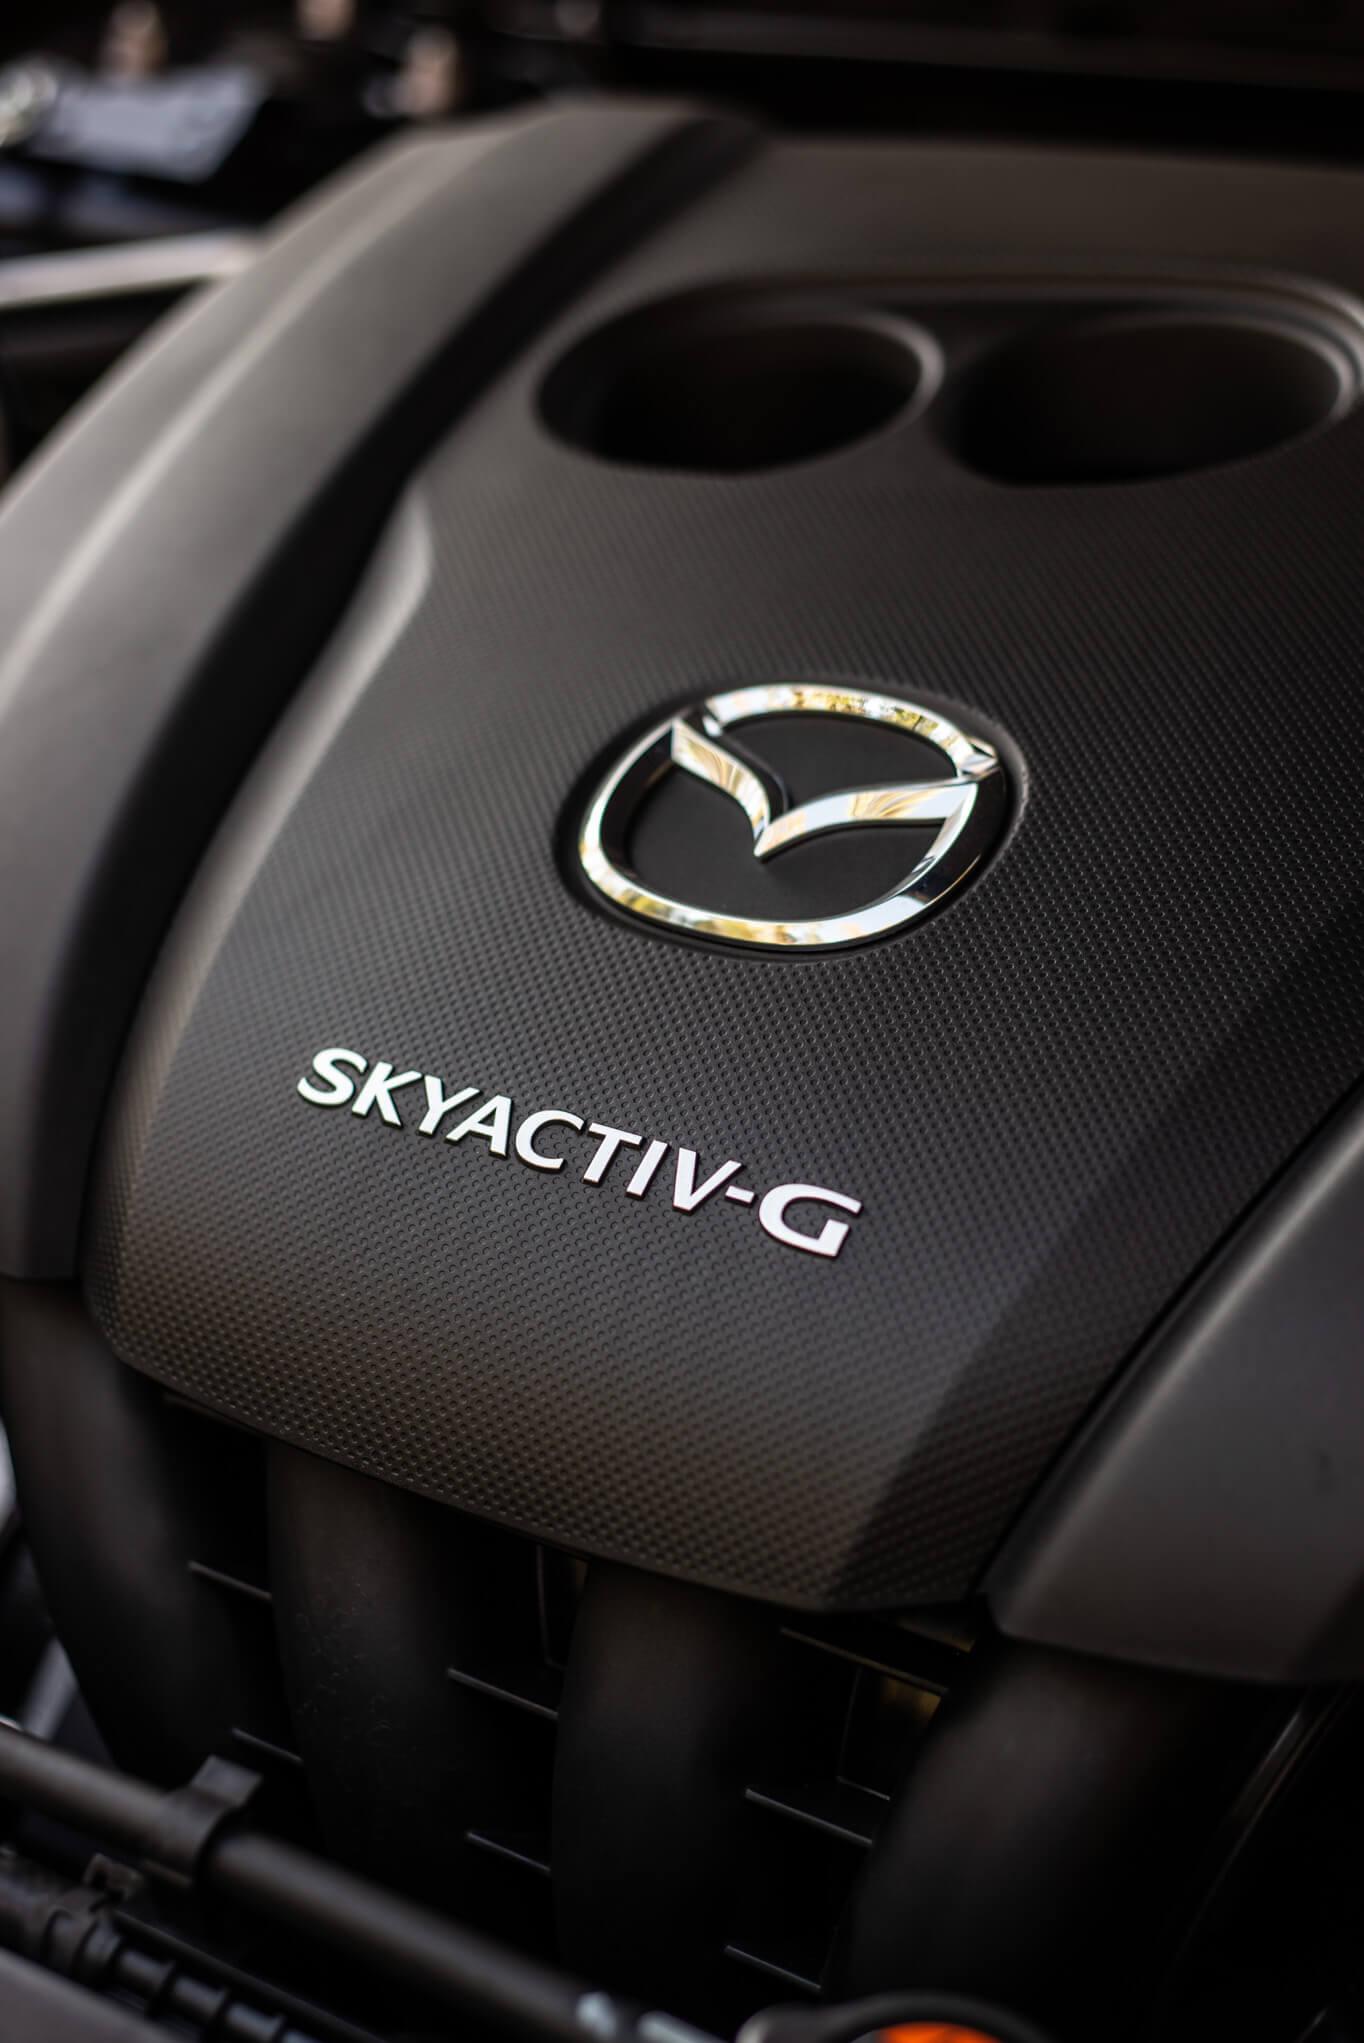 Motor Skyactiv-G 2.0 l, 122 cv